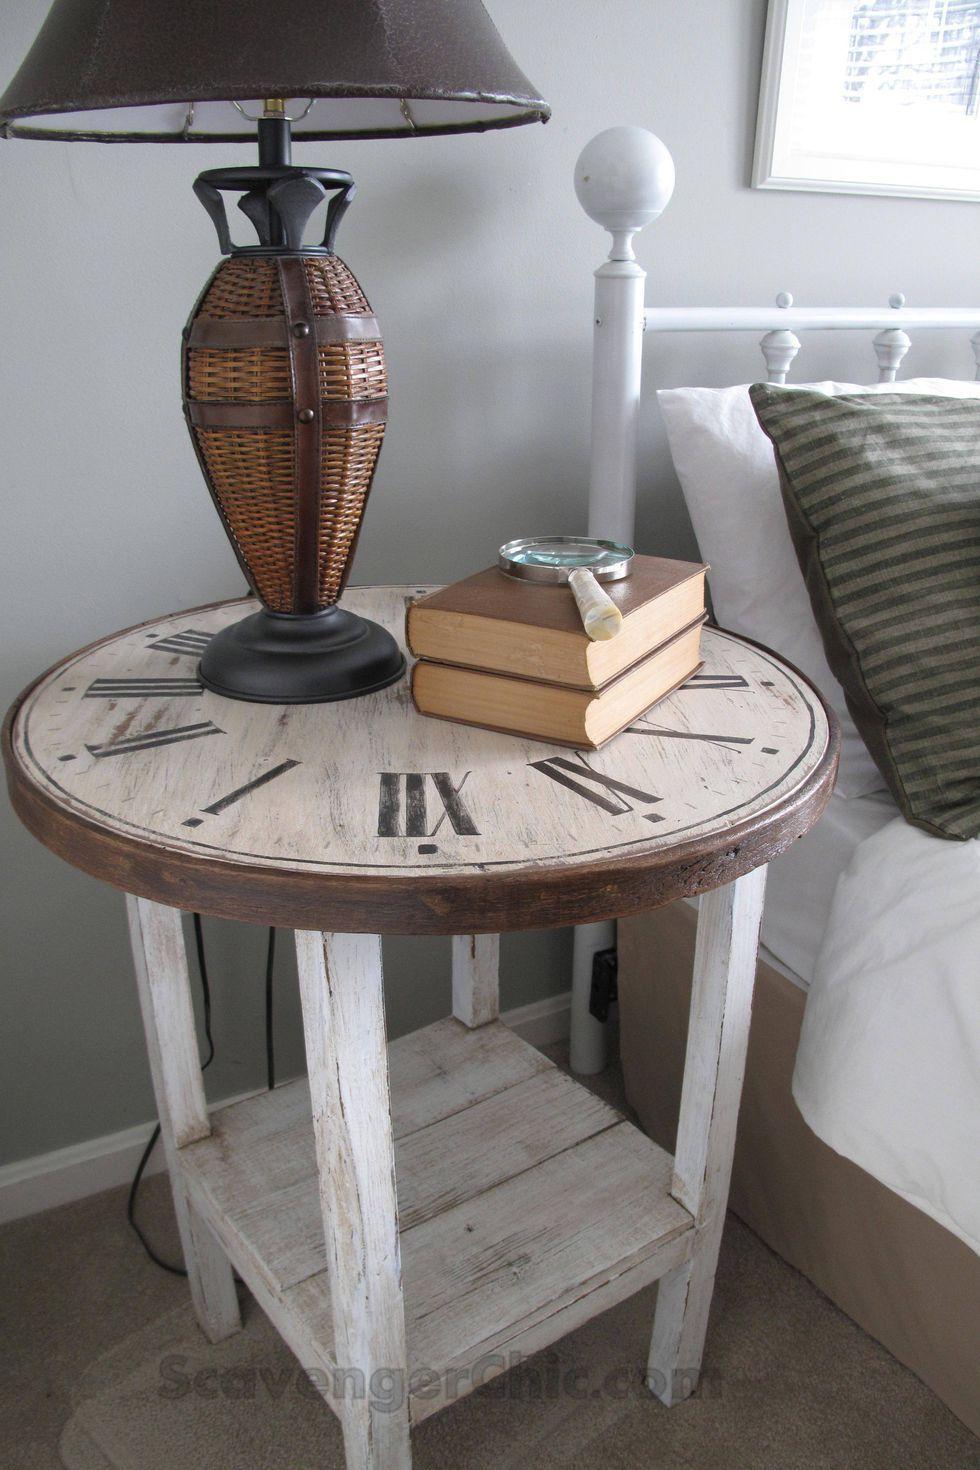 25 Totally Transformative Flea Market Flip Ideas Diy Furniture Cheap Furniture Makeover Shabby Chic Furniture